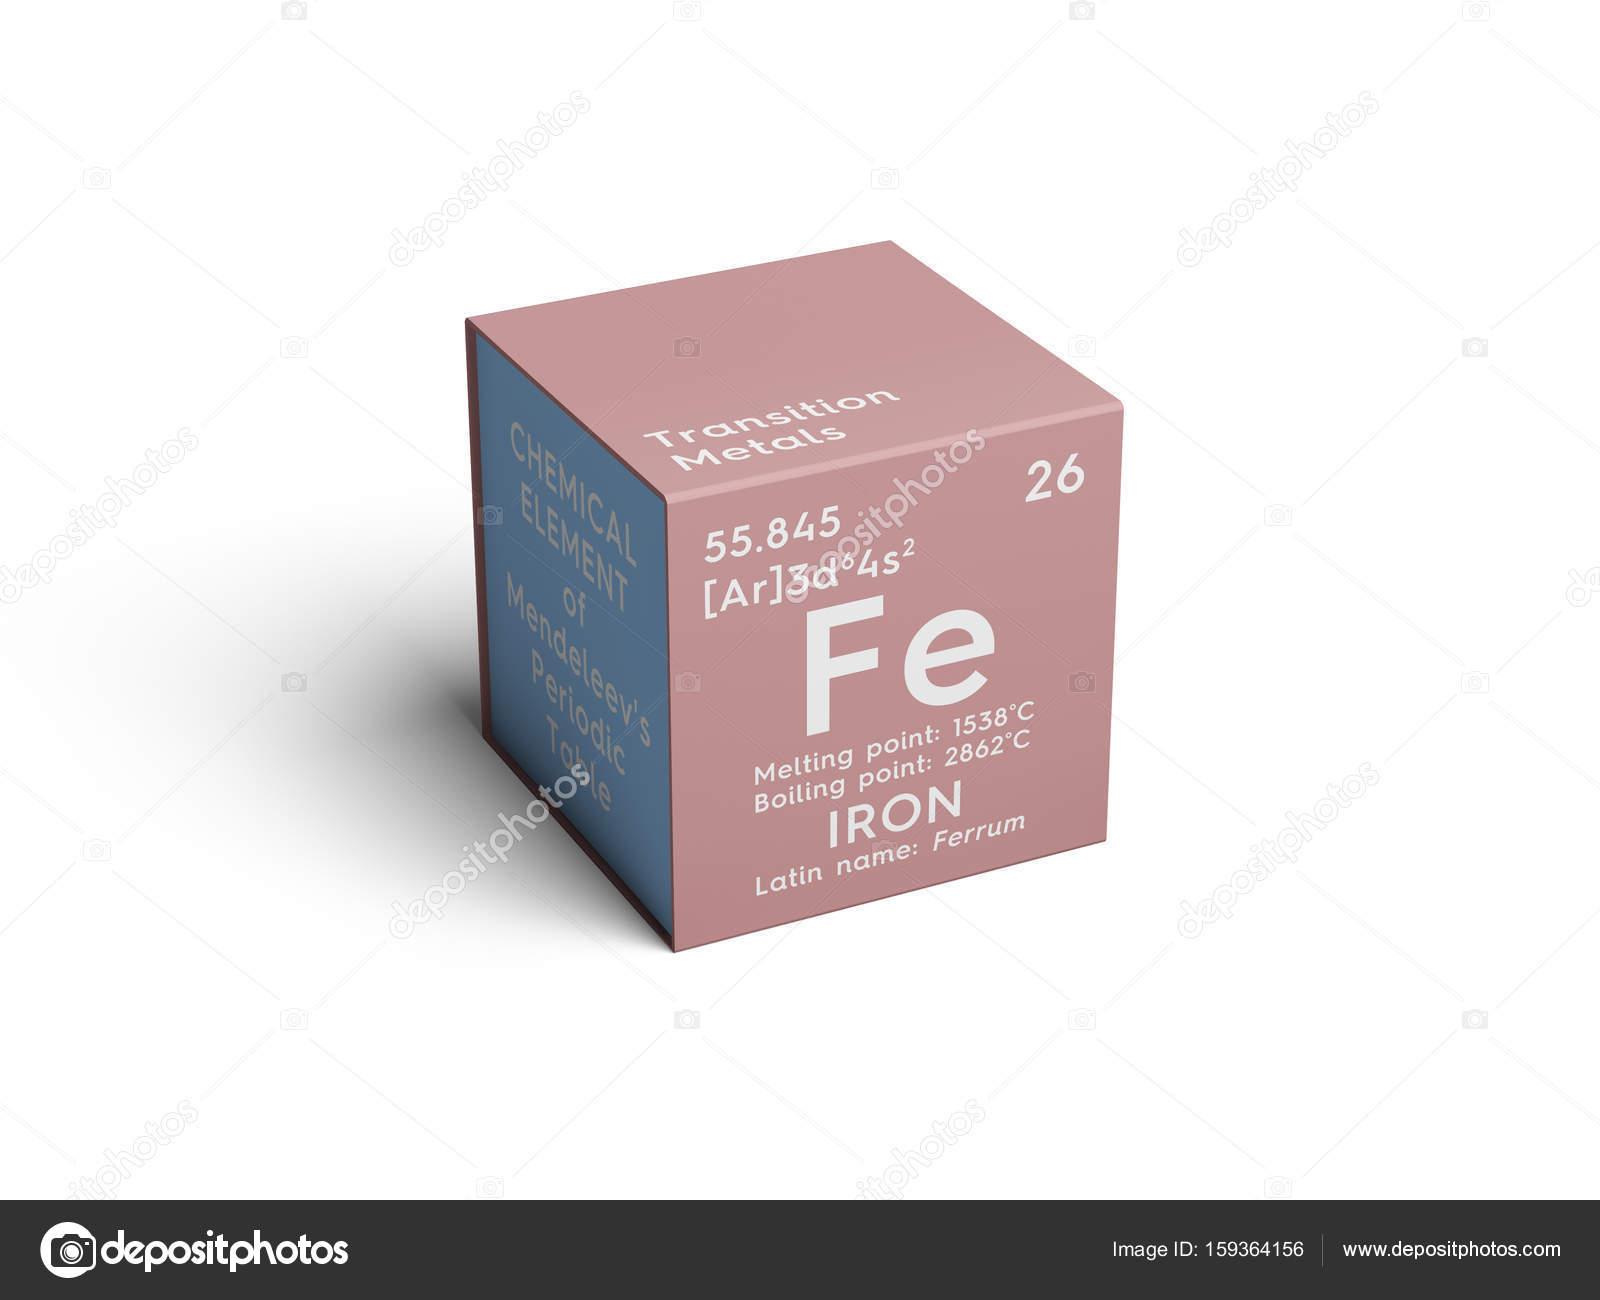 Hierro ferrum metales de transicin elemento qumico de la tabla hierro ferrum metales de transicin elemento qumico de la tabla de periodica de urtaz Images